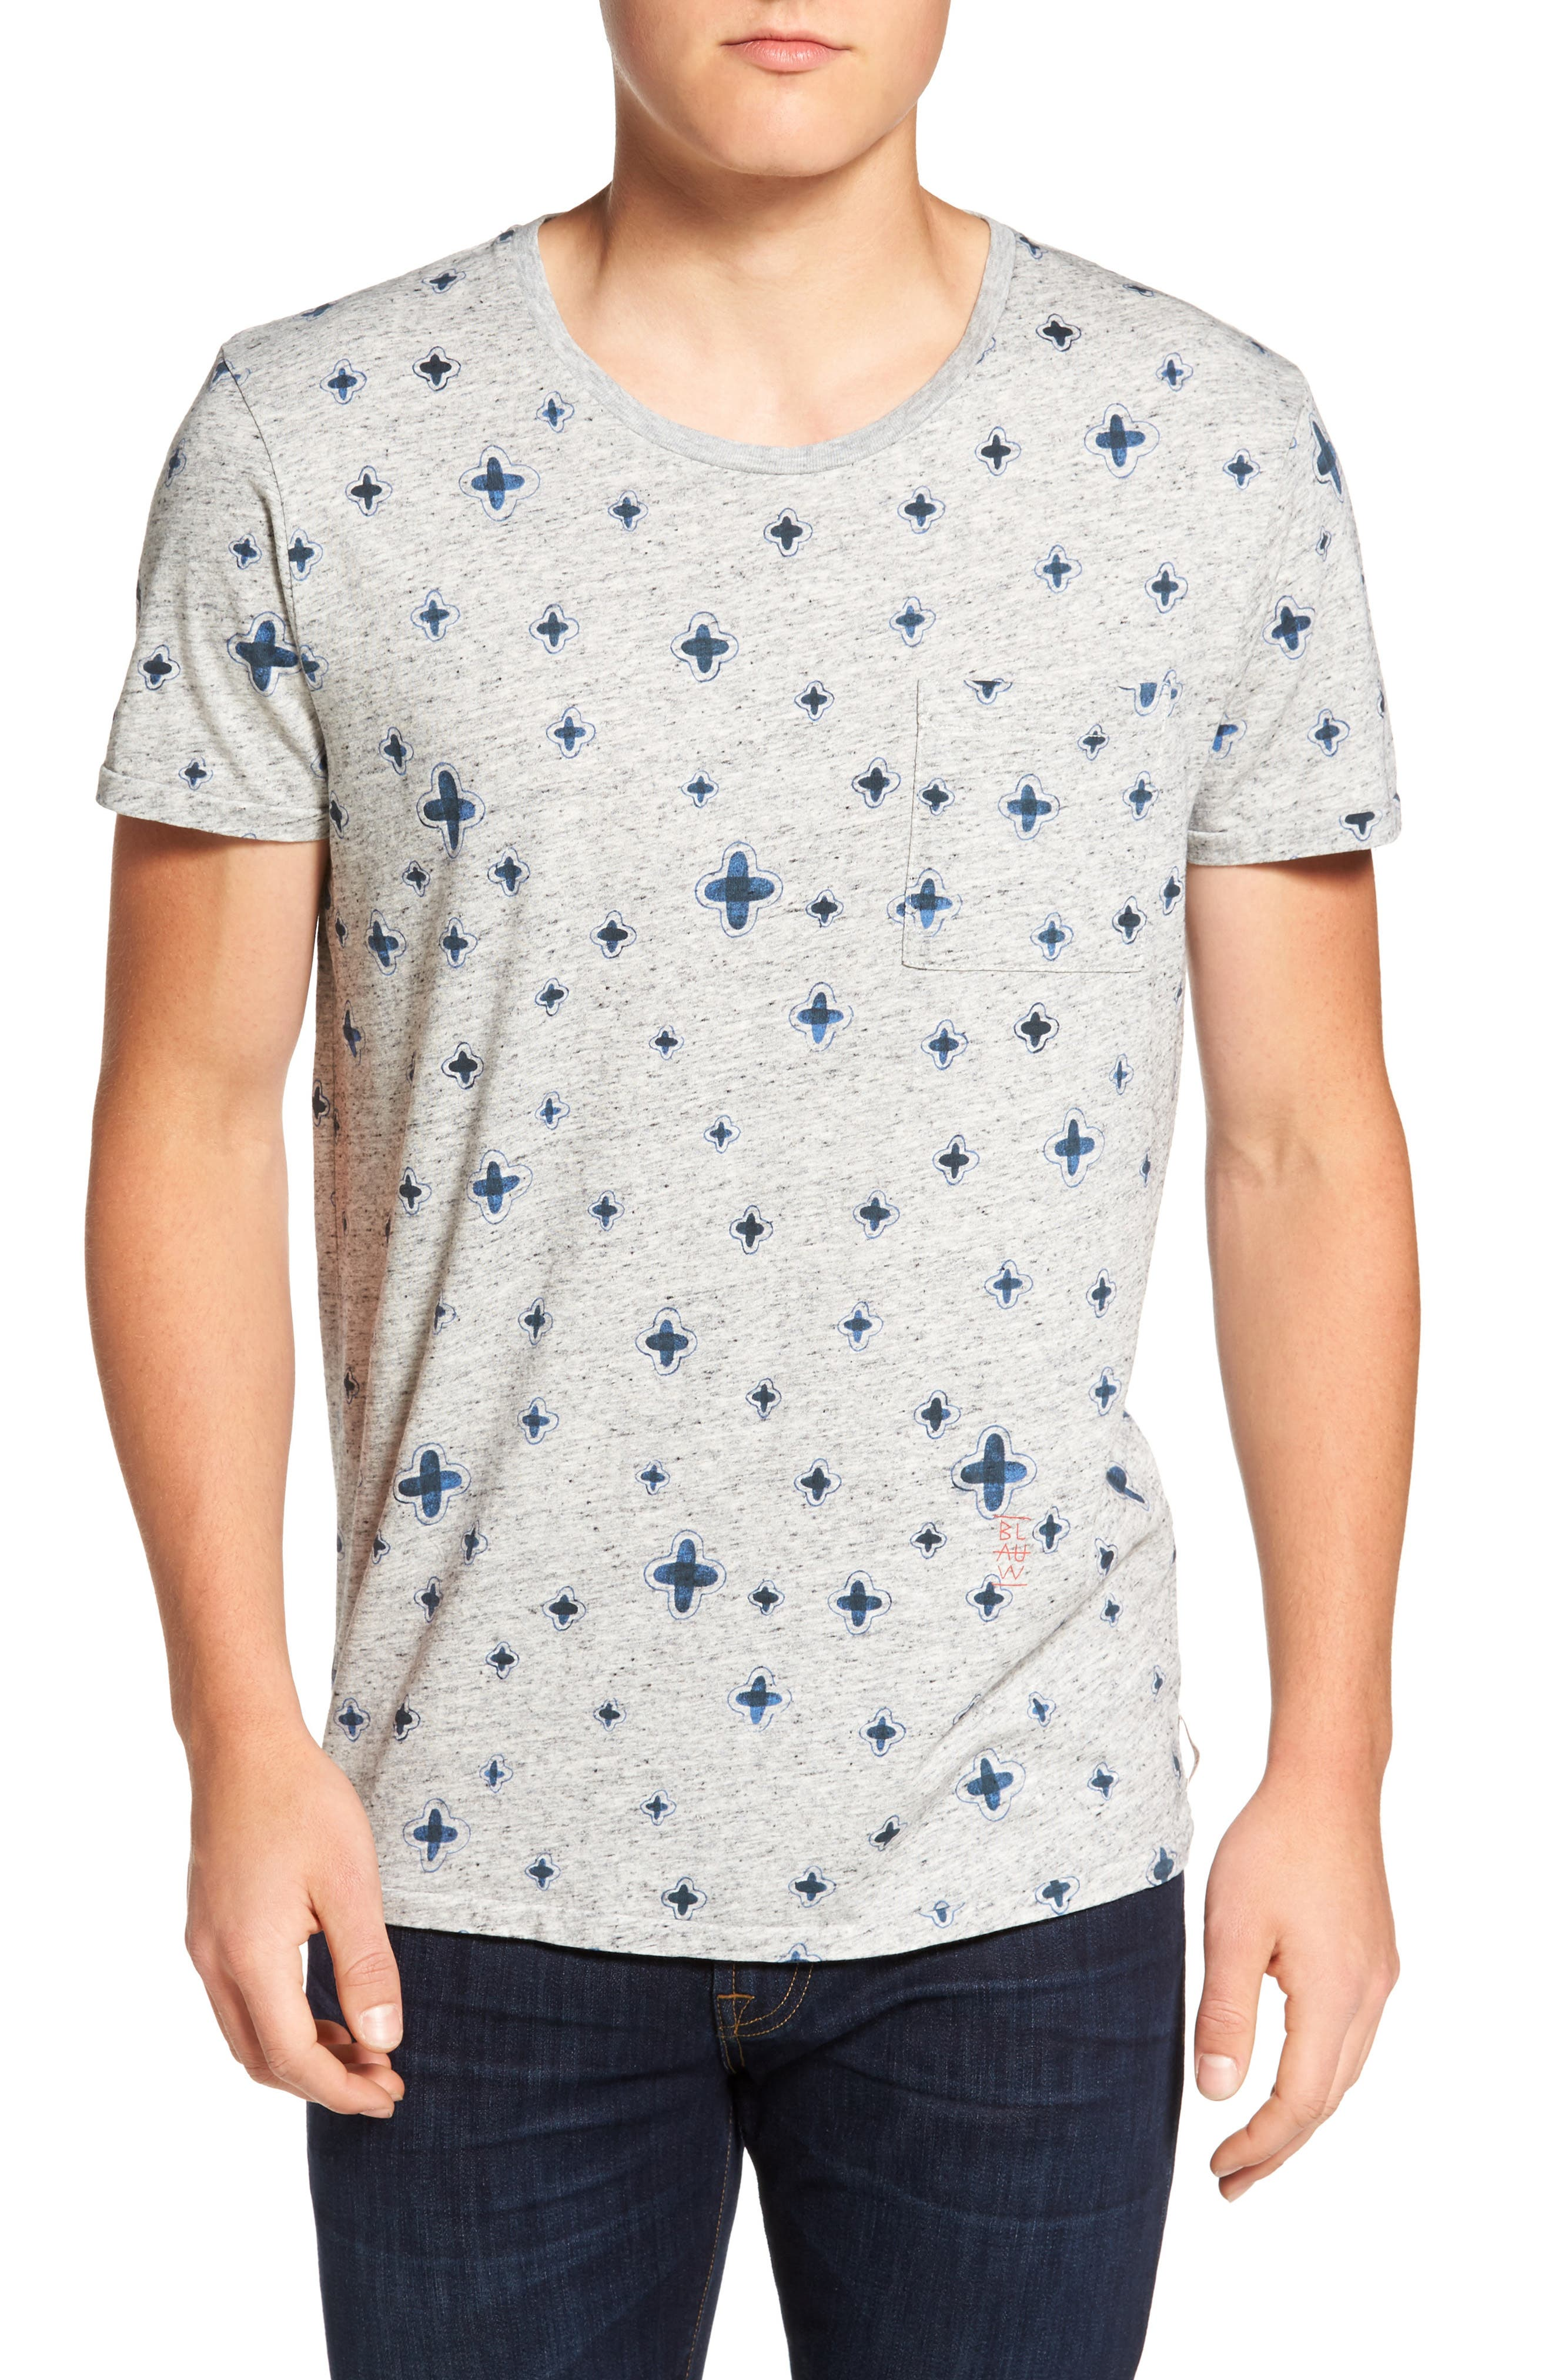 Main Image - Scotch & Soda AMS T-Shirt